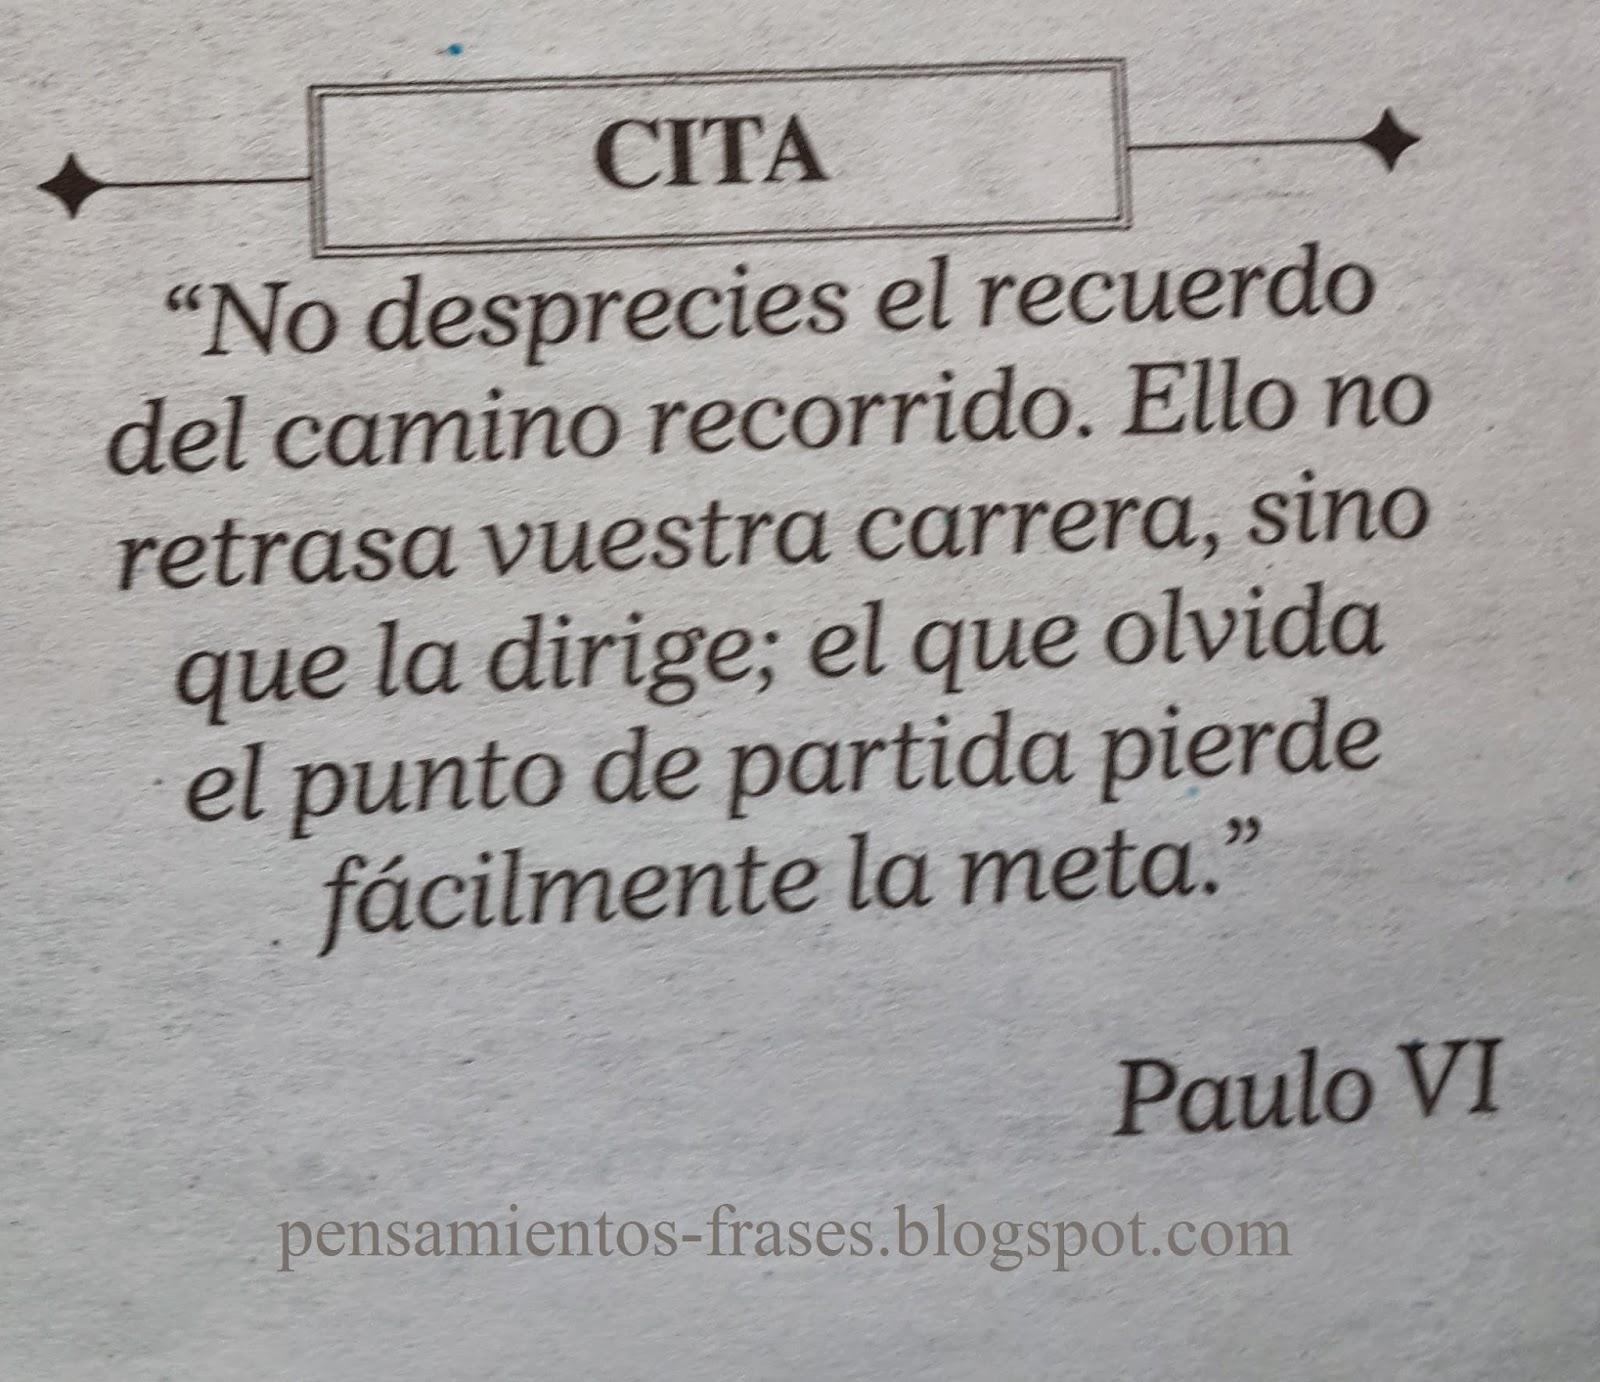 frases de Paulo VI